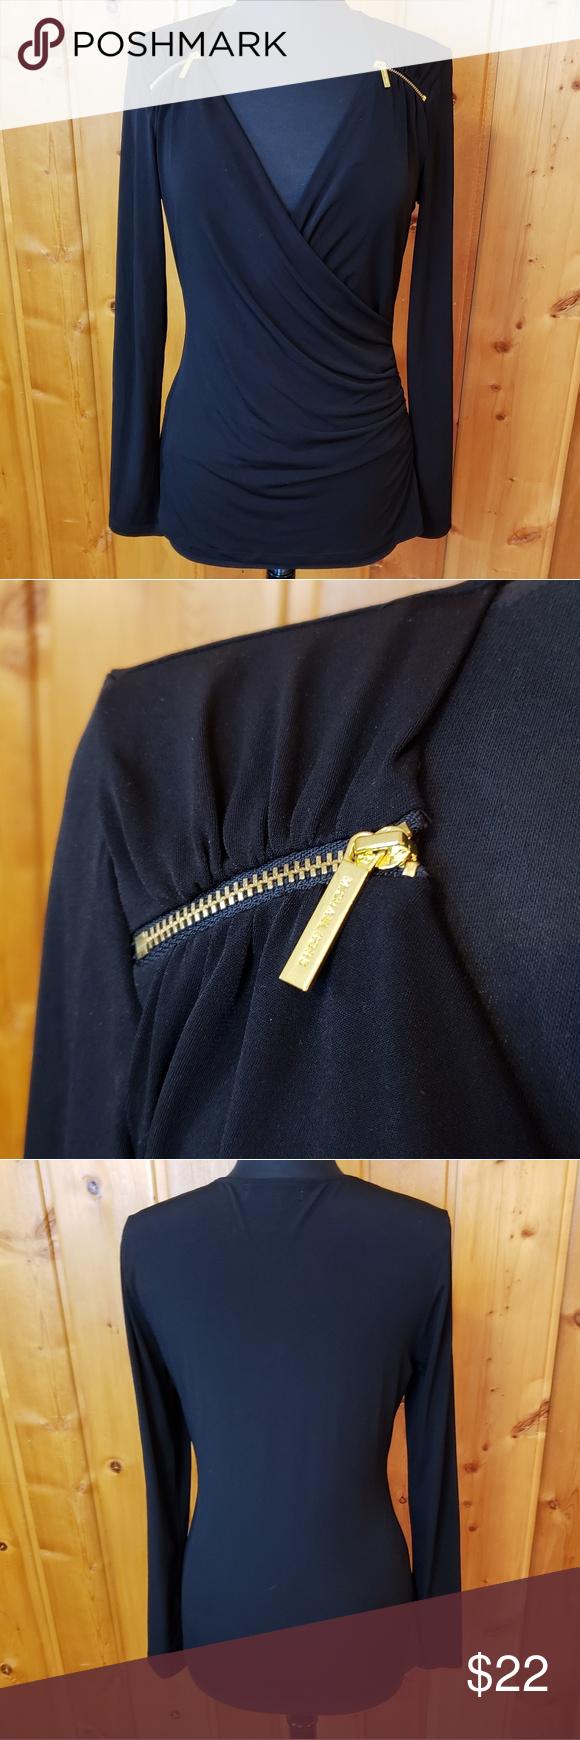 Michael Kors Zipper Detail Ruched Top Michael Kors